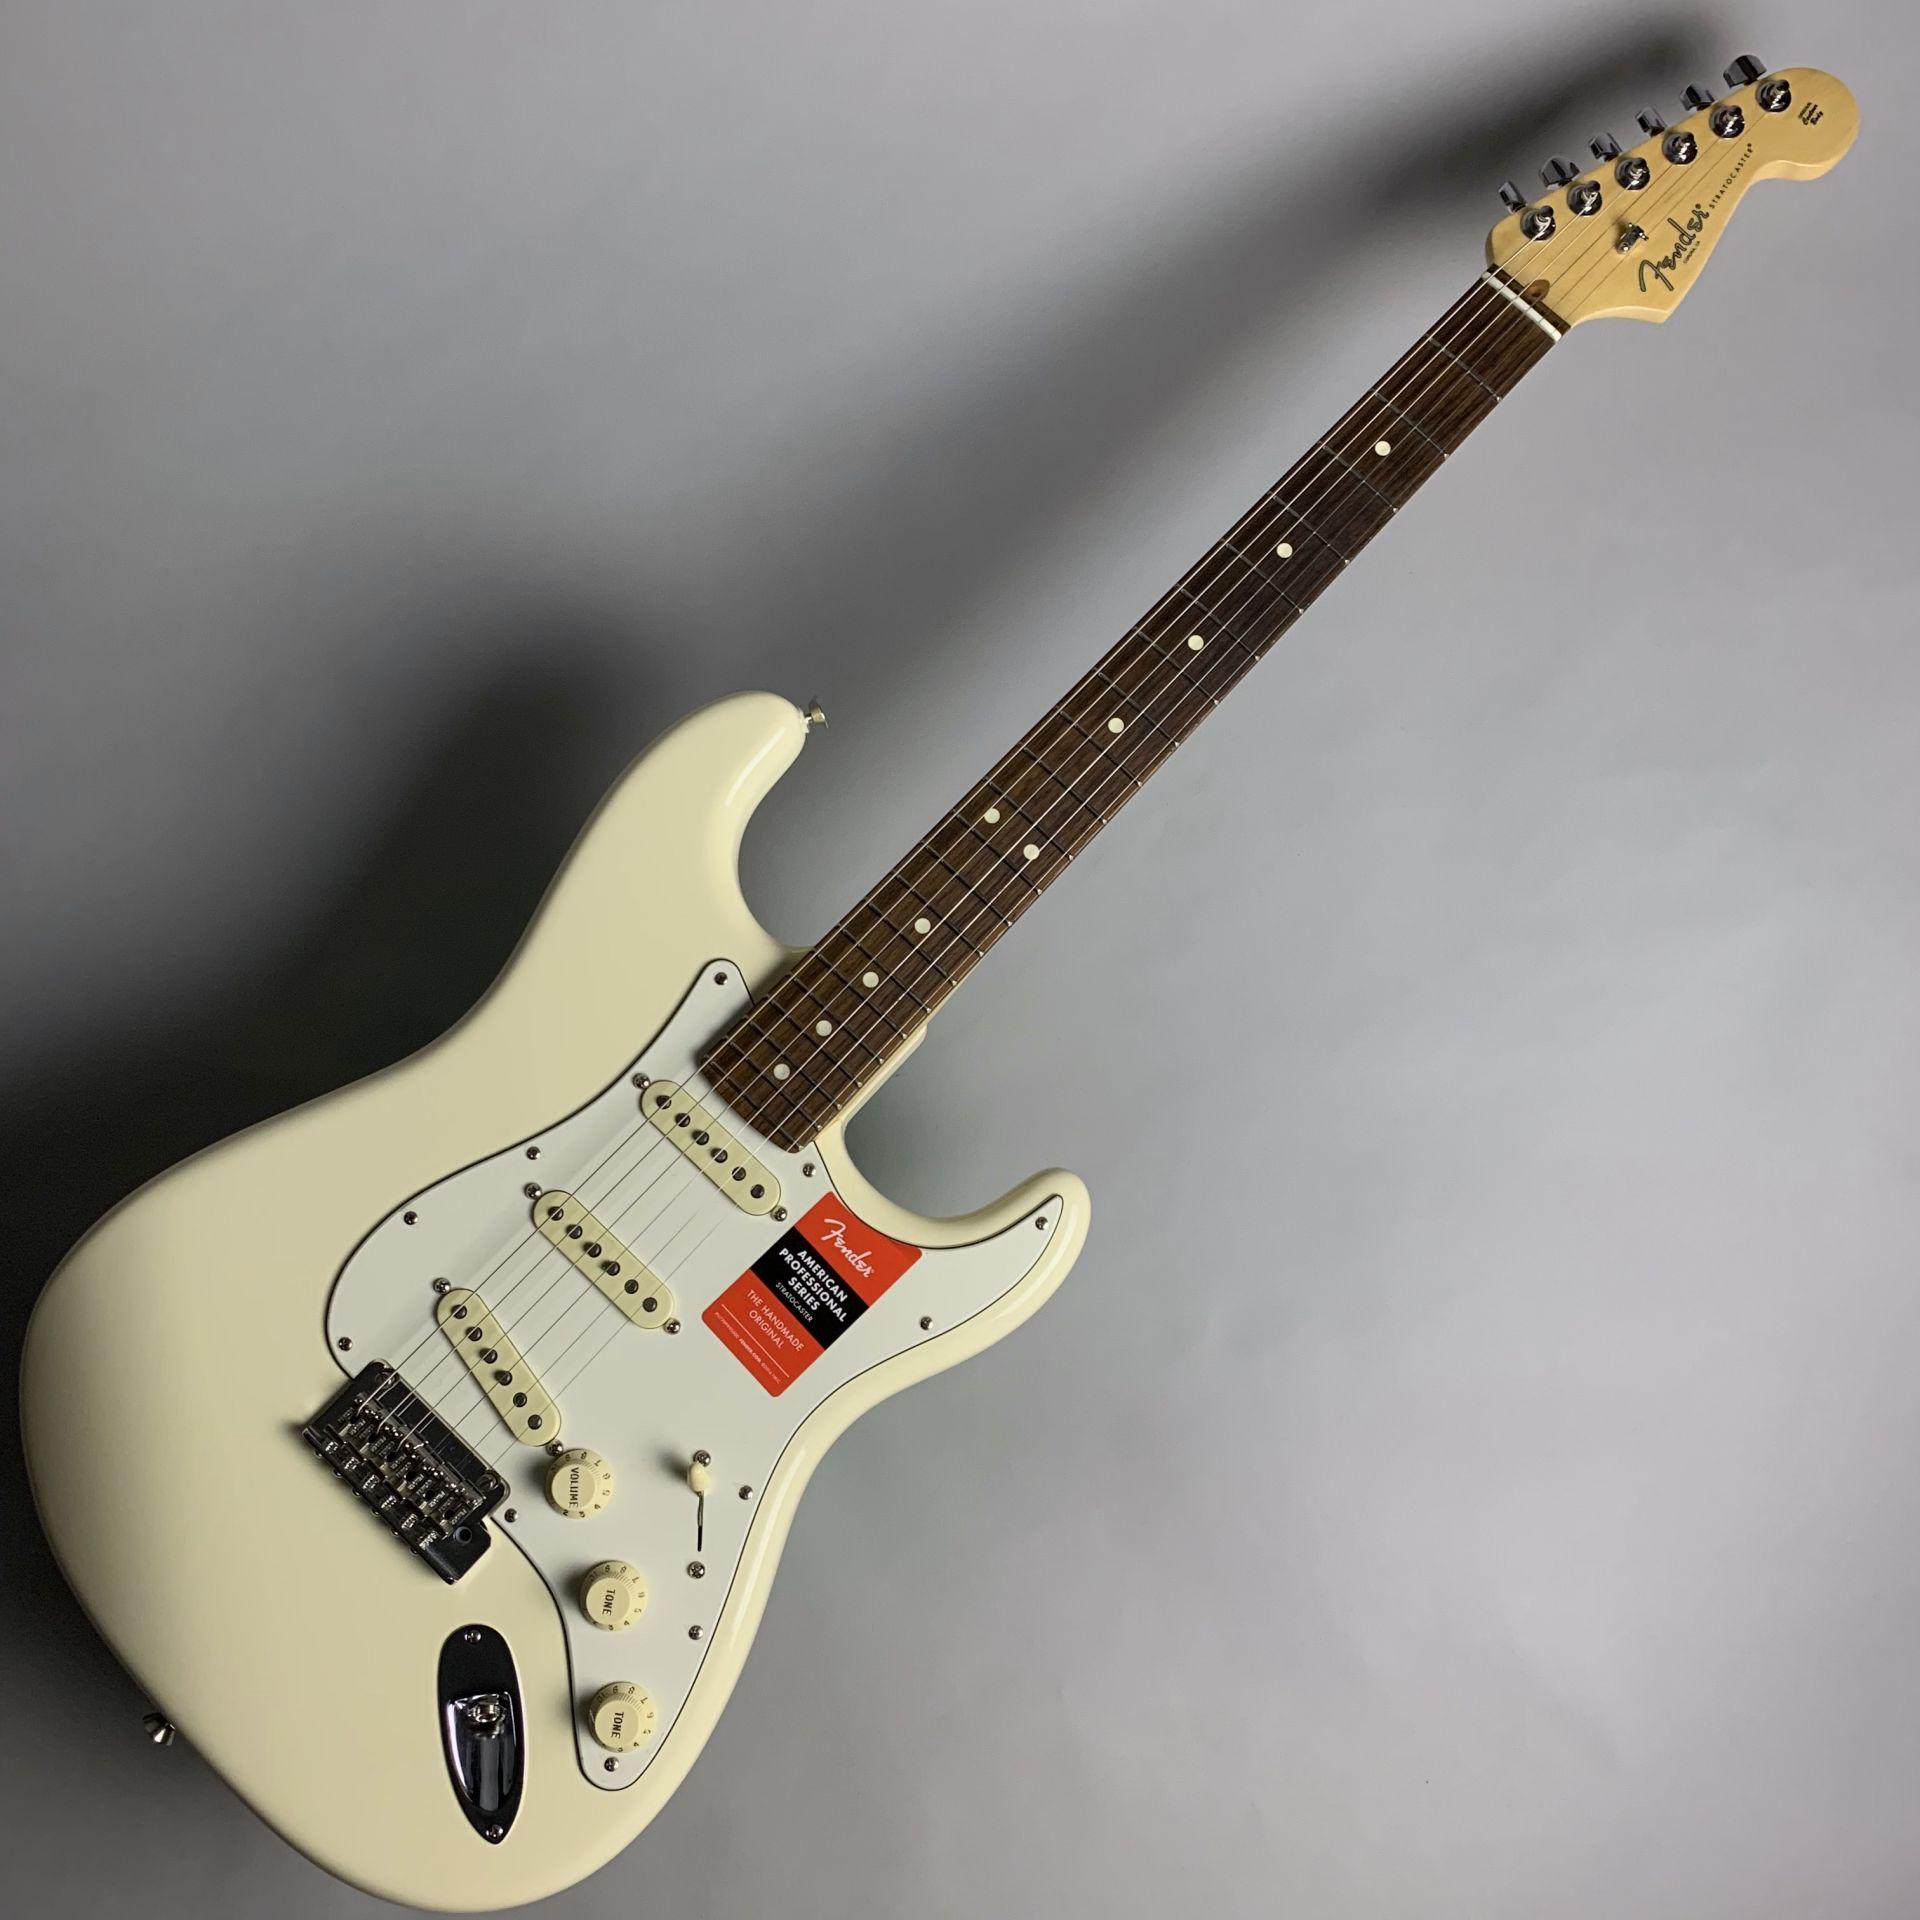 American Professional Stratocasterのボディトップ-アップ画像